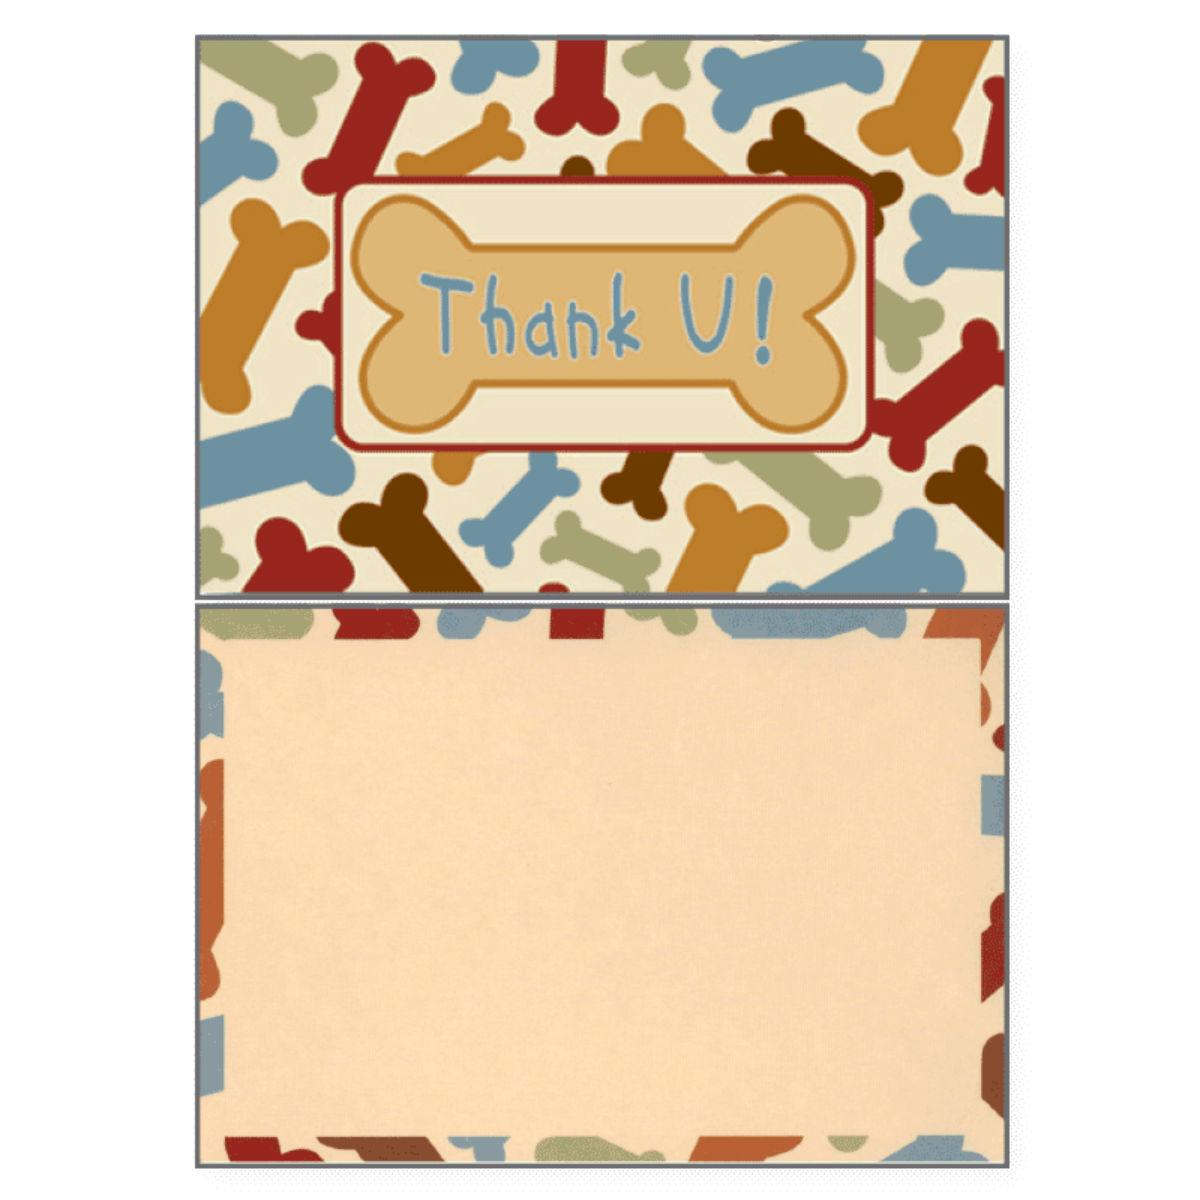 Thank You Greeting Card by Dog Speak - Bones